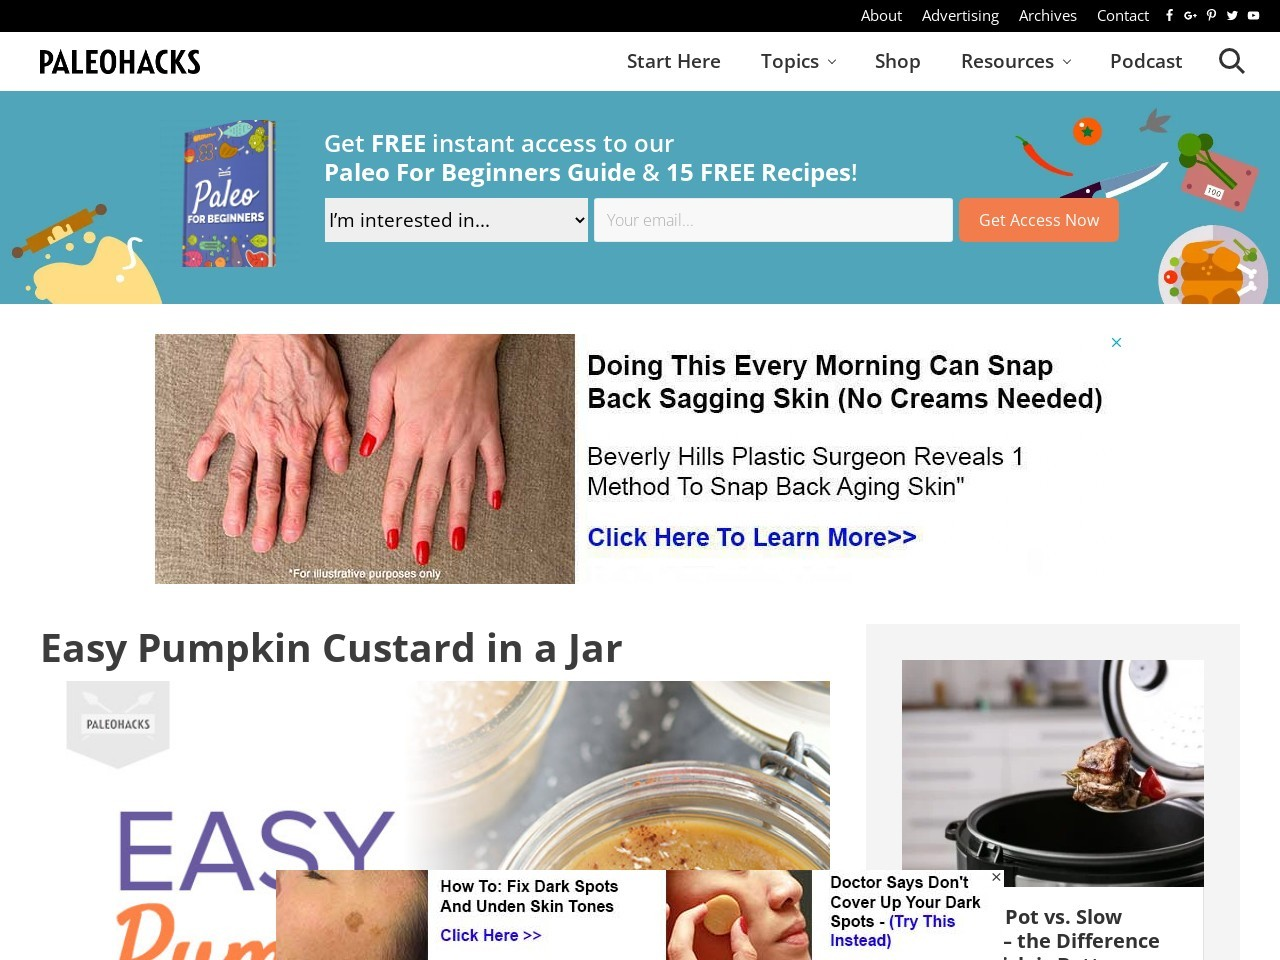 Easy Pumpkin Custard in a Jar